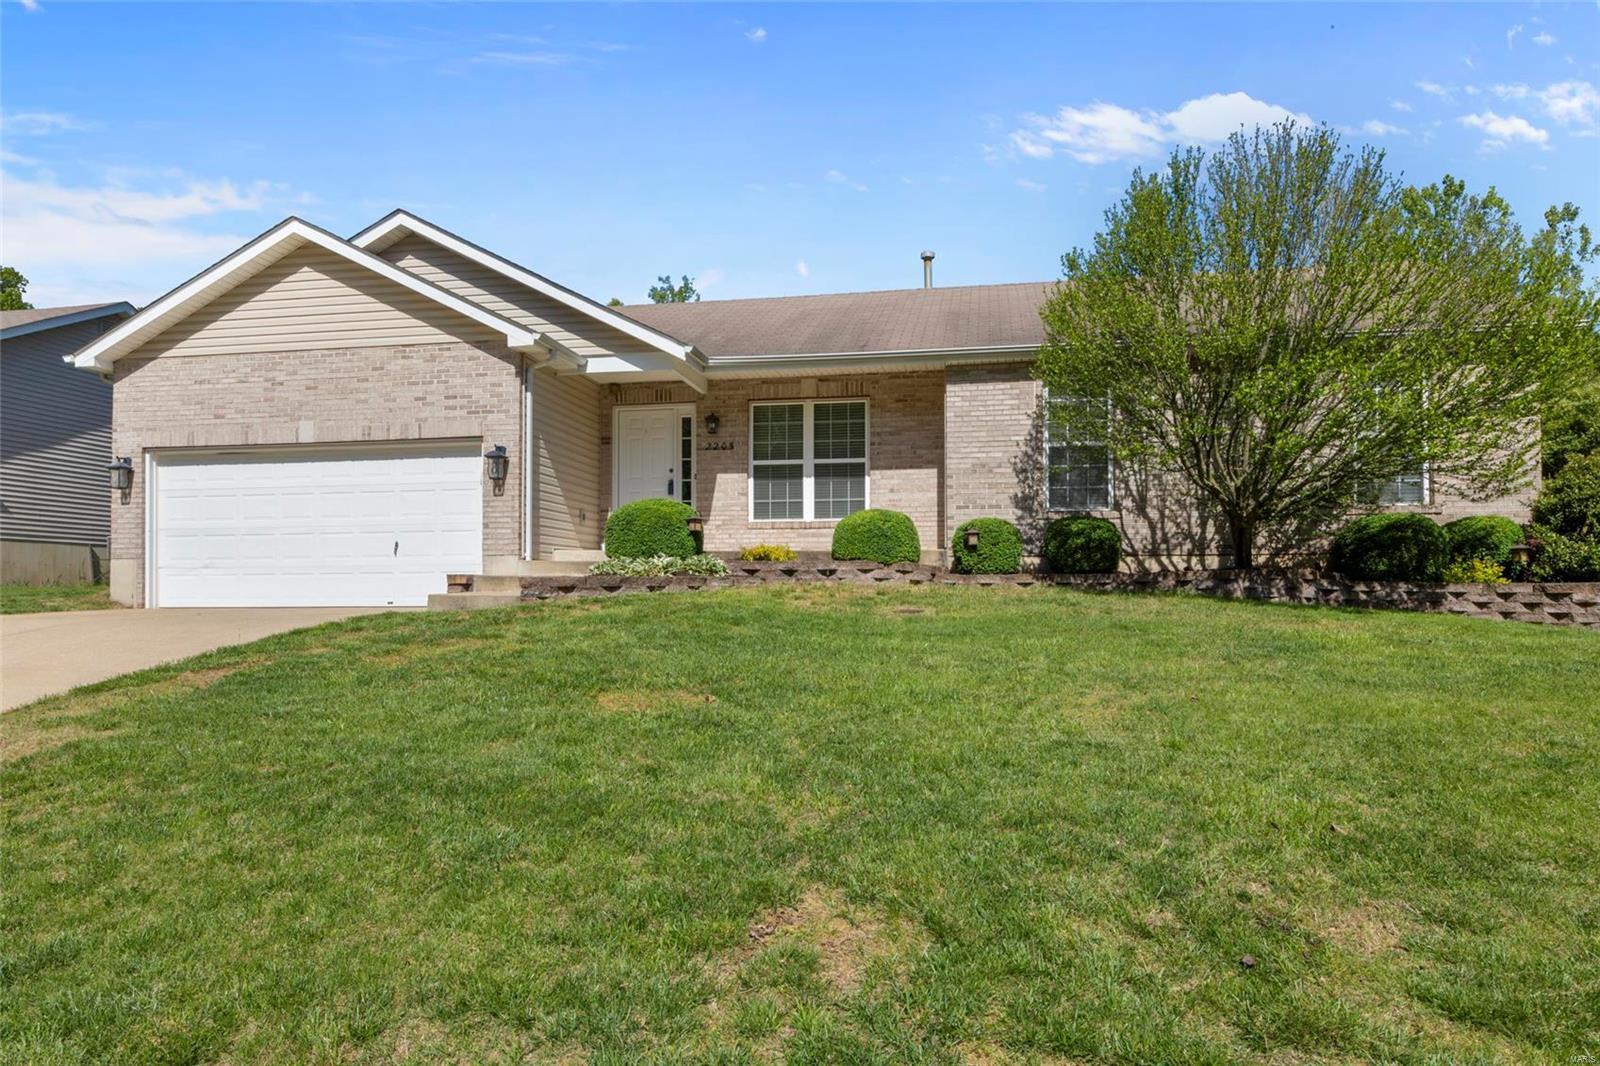 2205 Fairway Property Photo - High Ridge, MO real estate listing